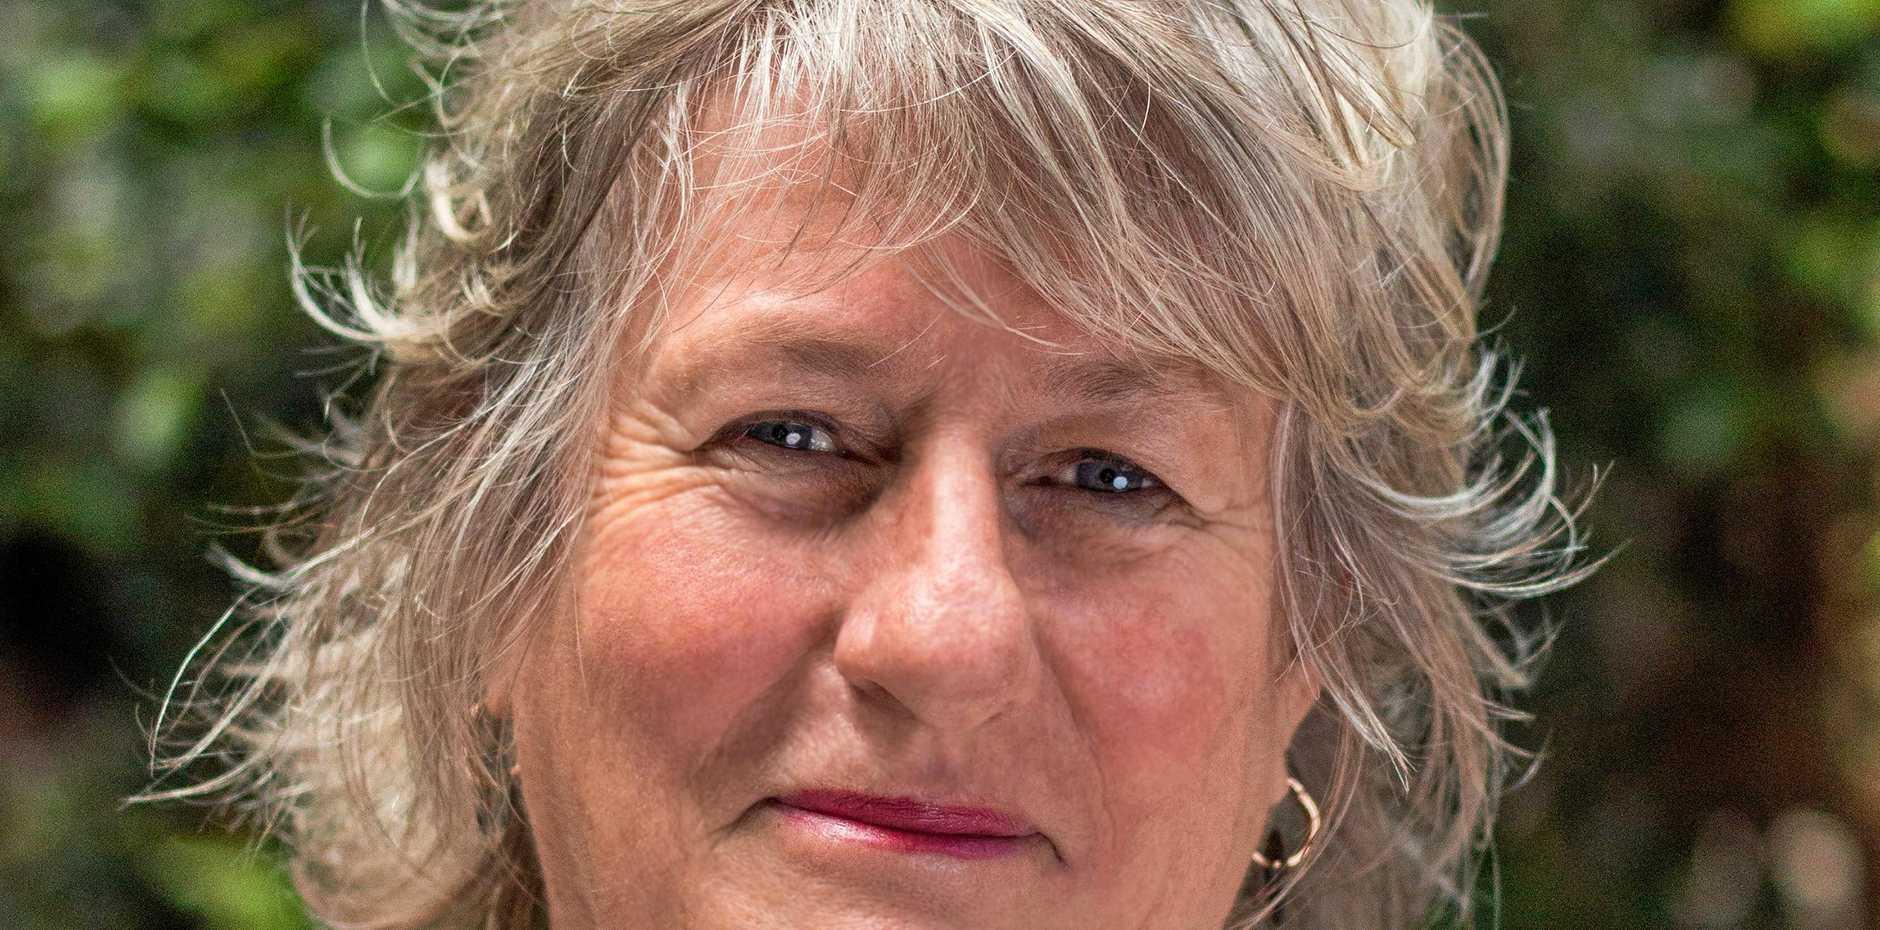 Veranda Talk columnist  for The Lismore Echo Dr Airdre Grant.